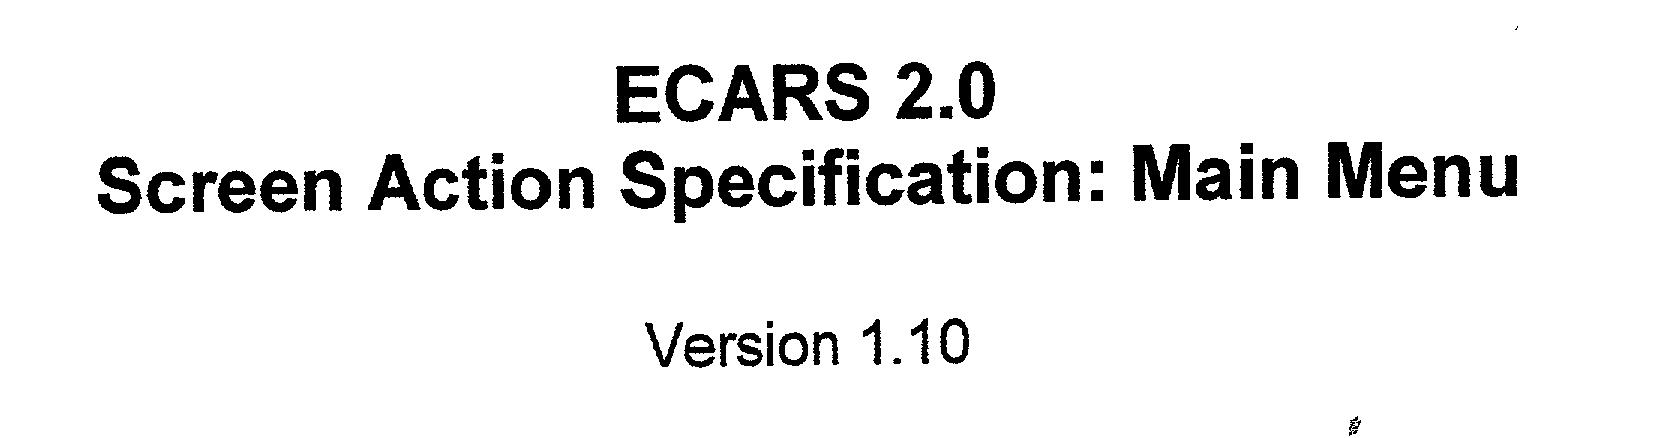 Figure US20030125992A1-20030703-P01371